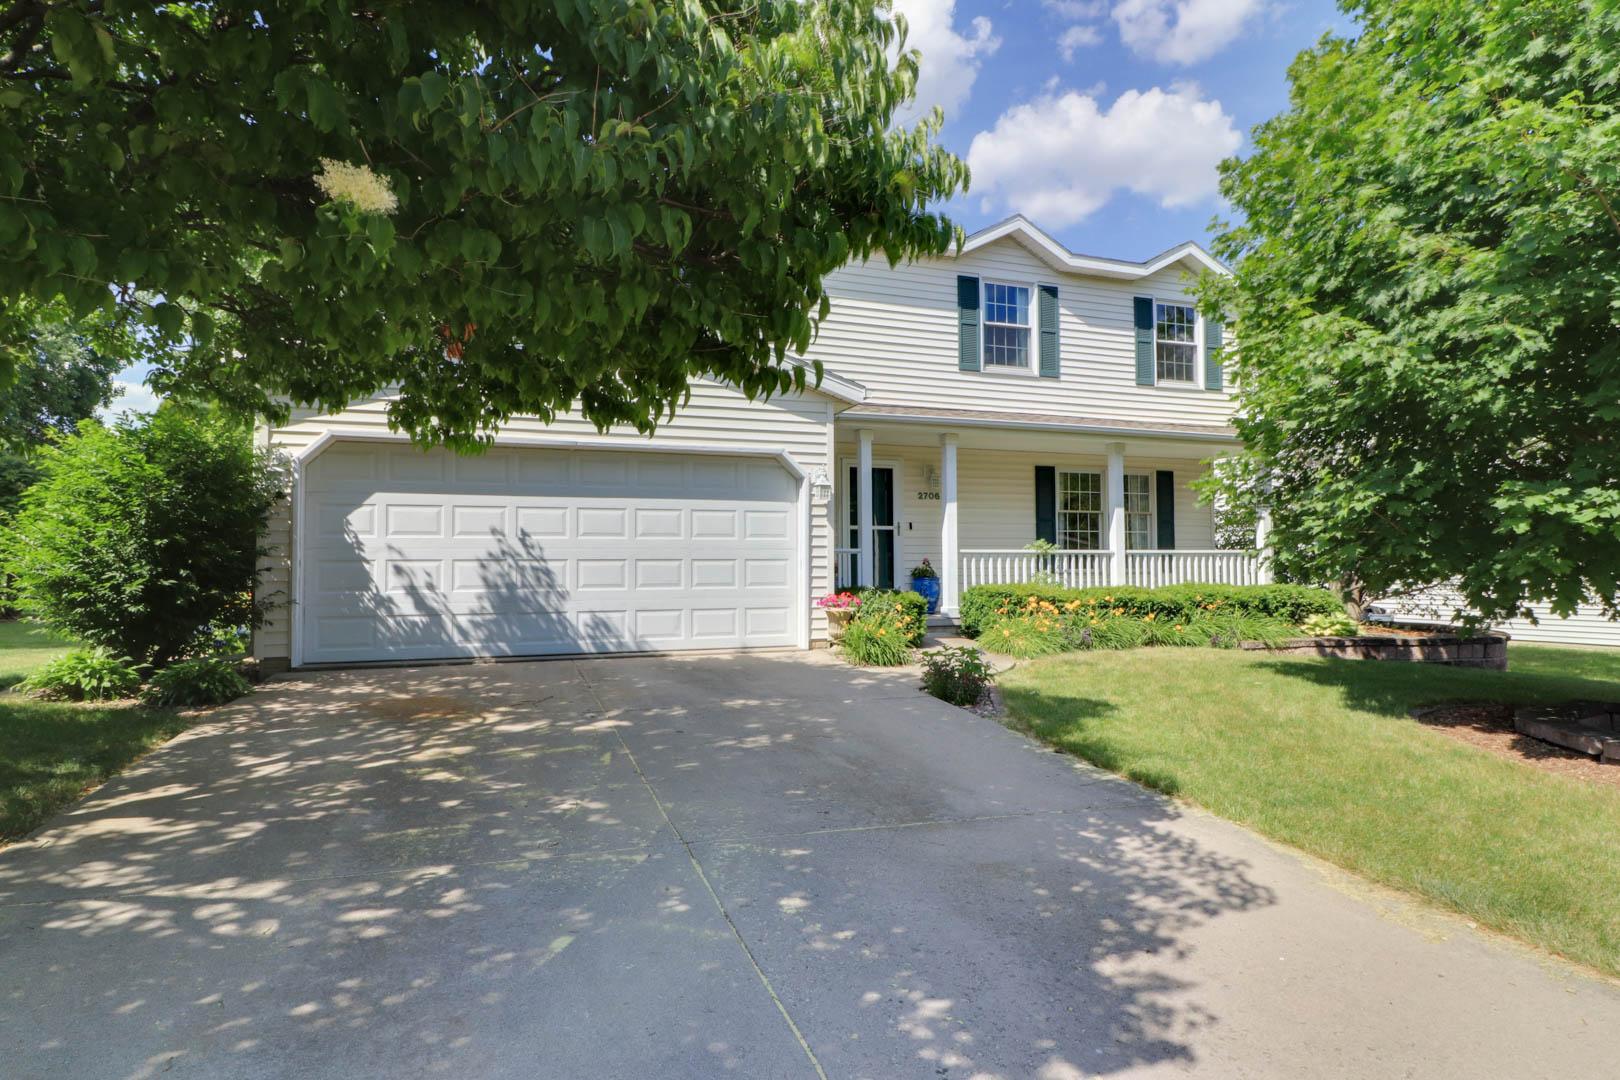 2706 Sandstone Street, Bloomington IL 61704 – SOLD!